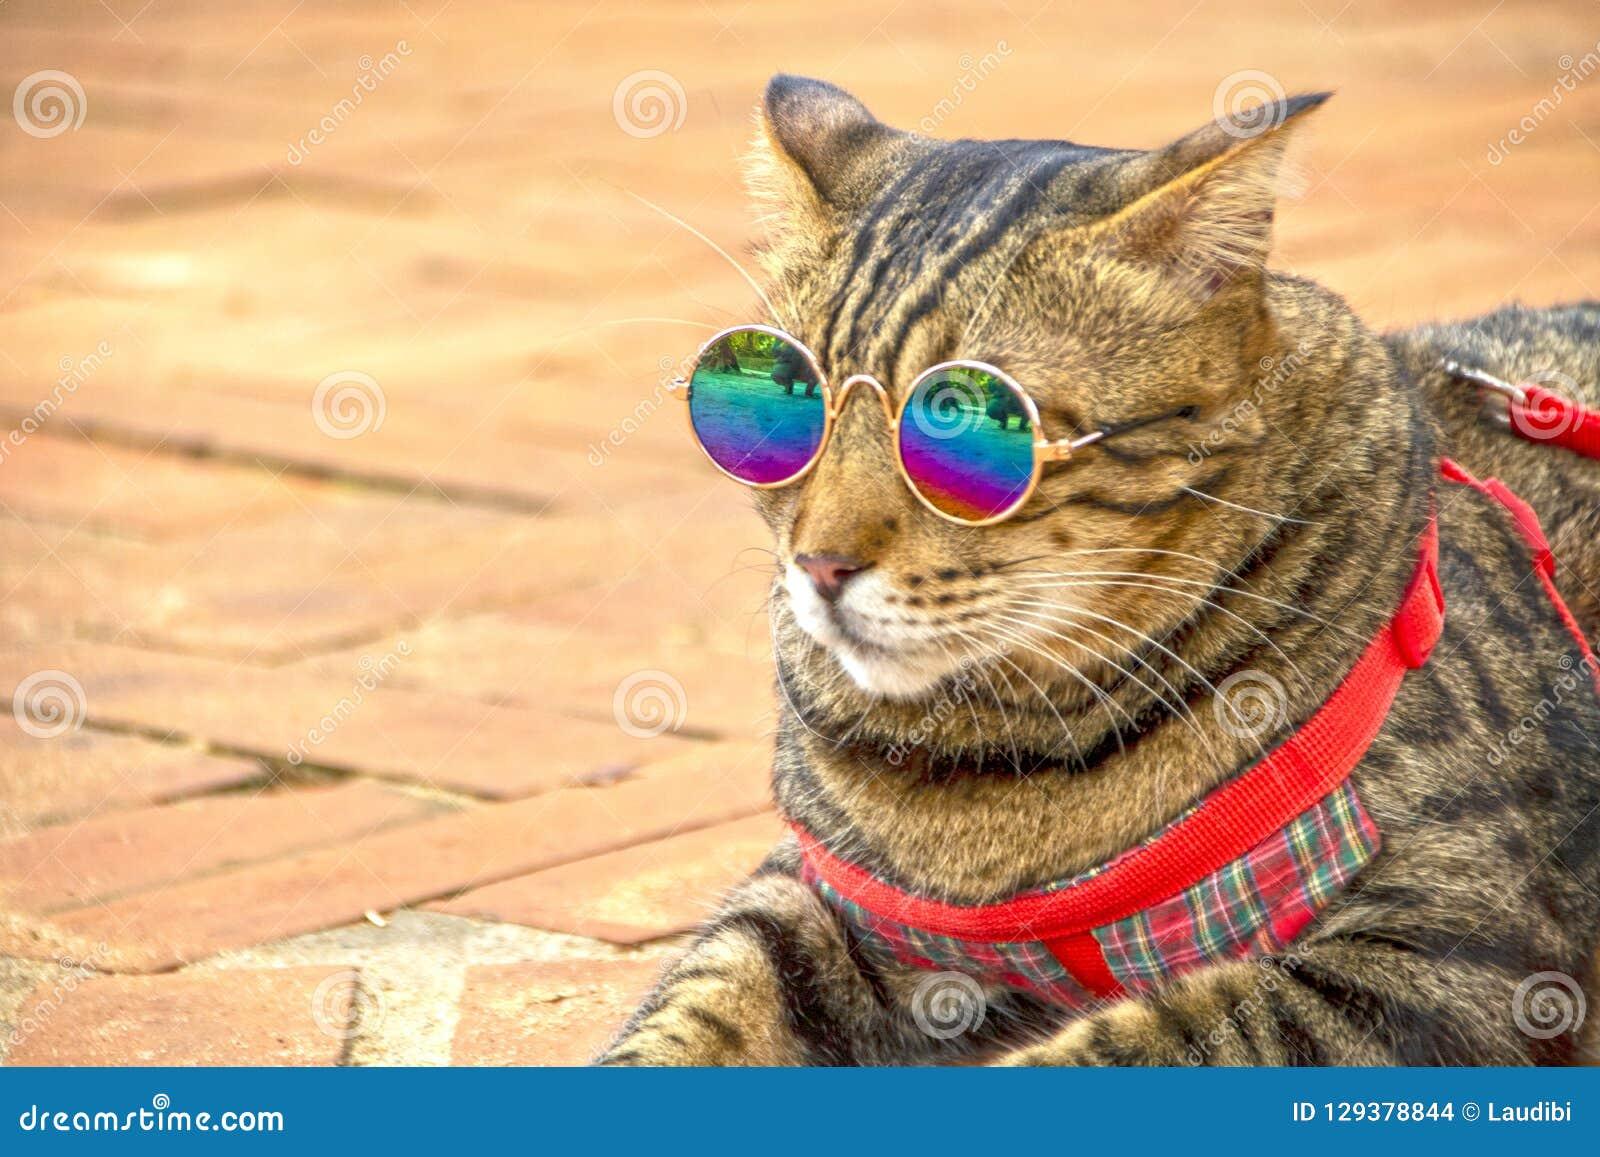 Cool Cat Stock Photo Image Of Glasses Feline Elegant 129378844